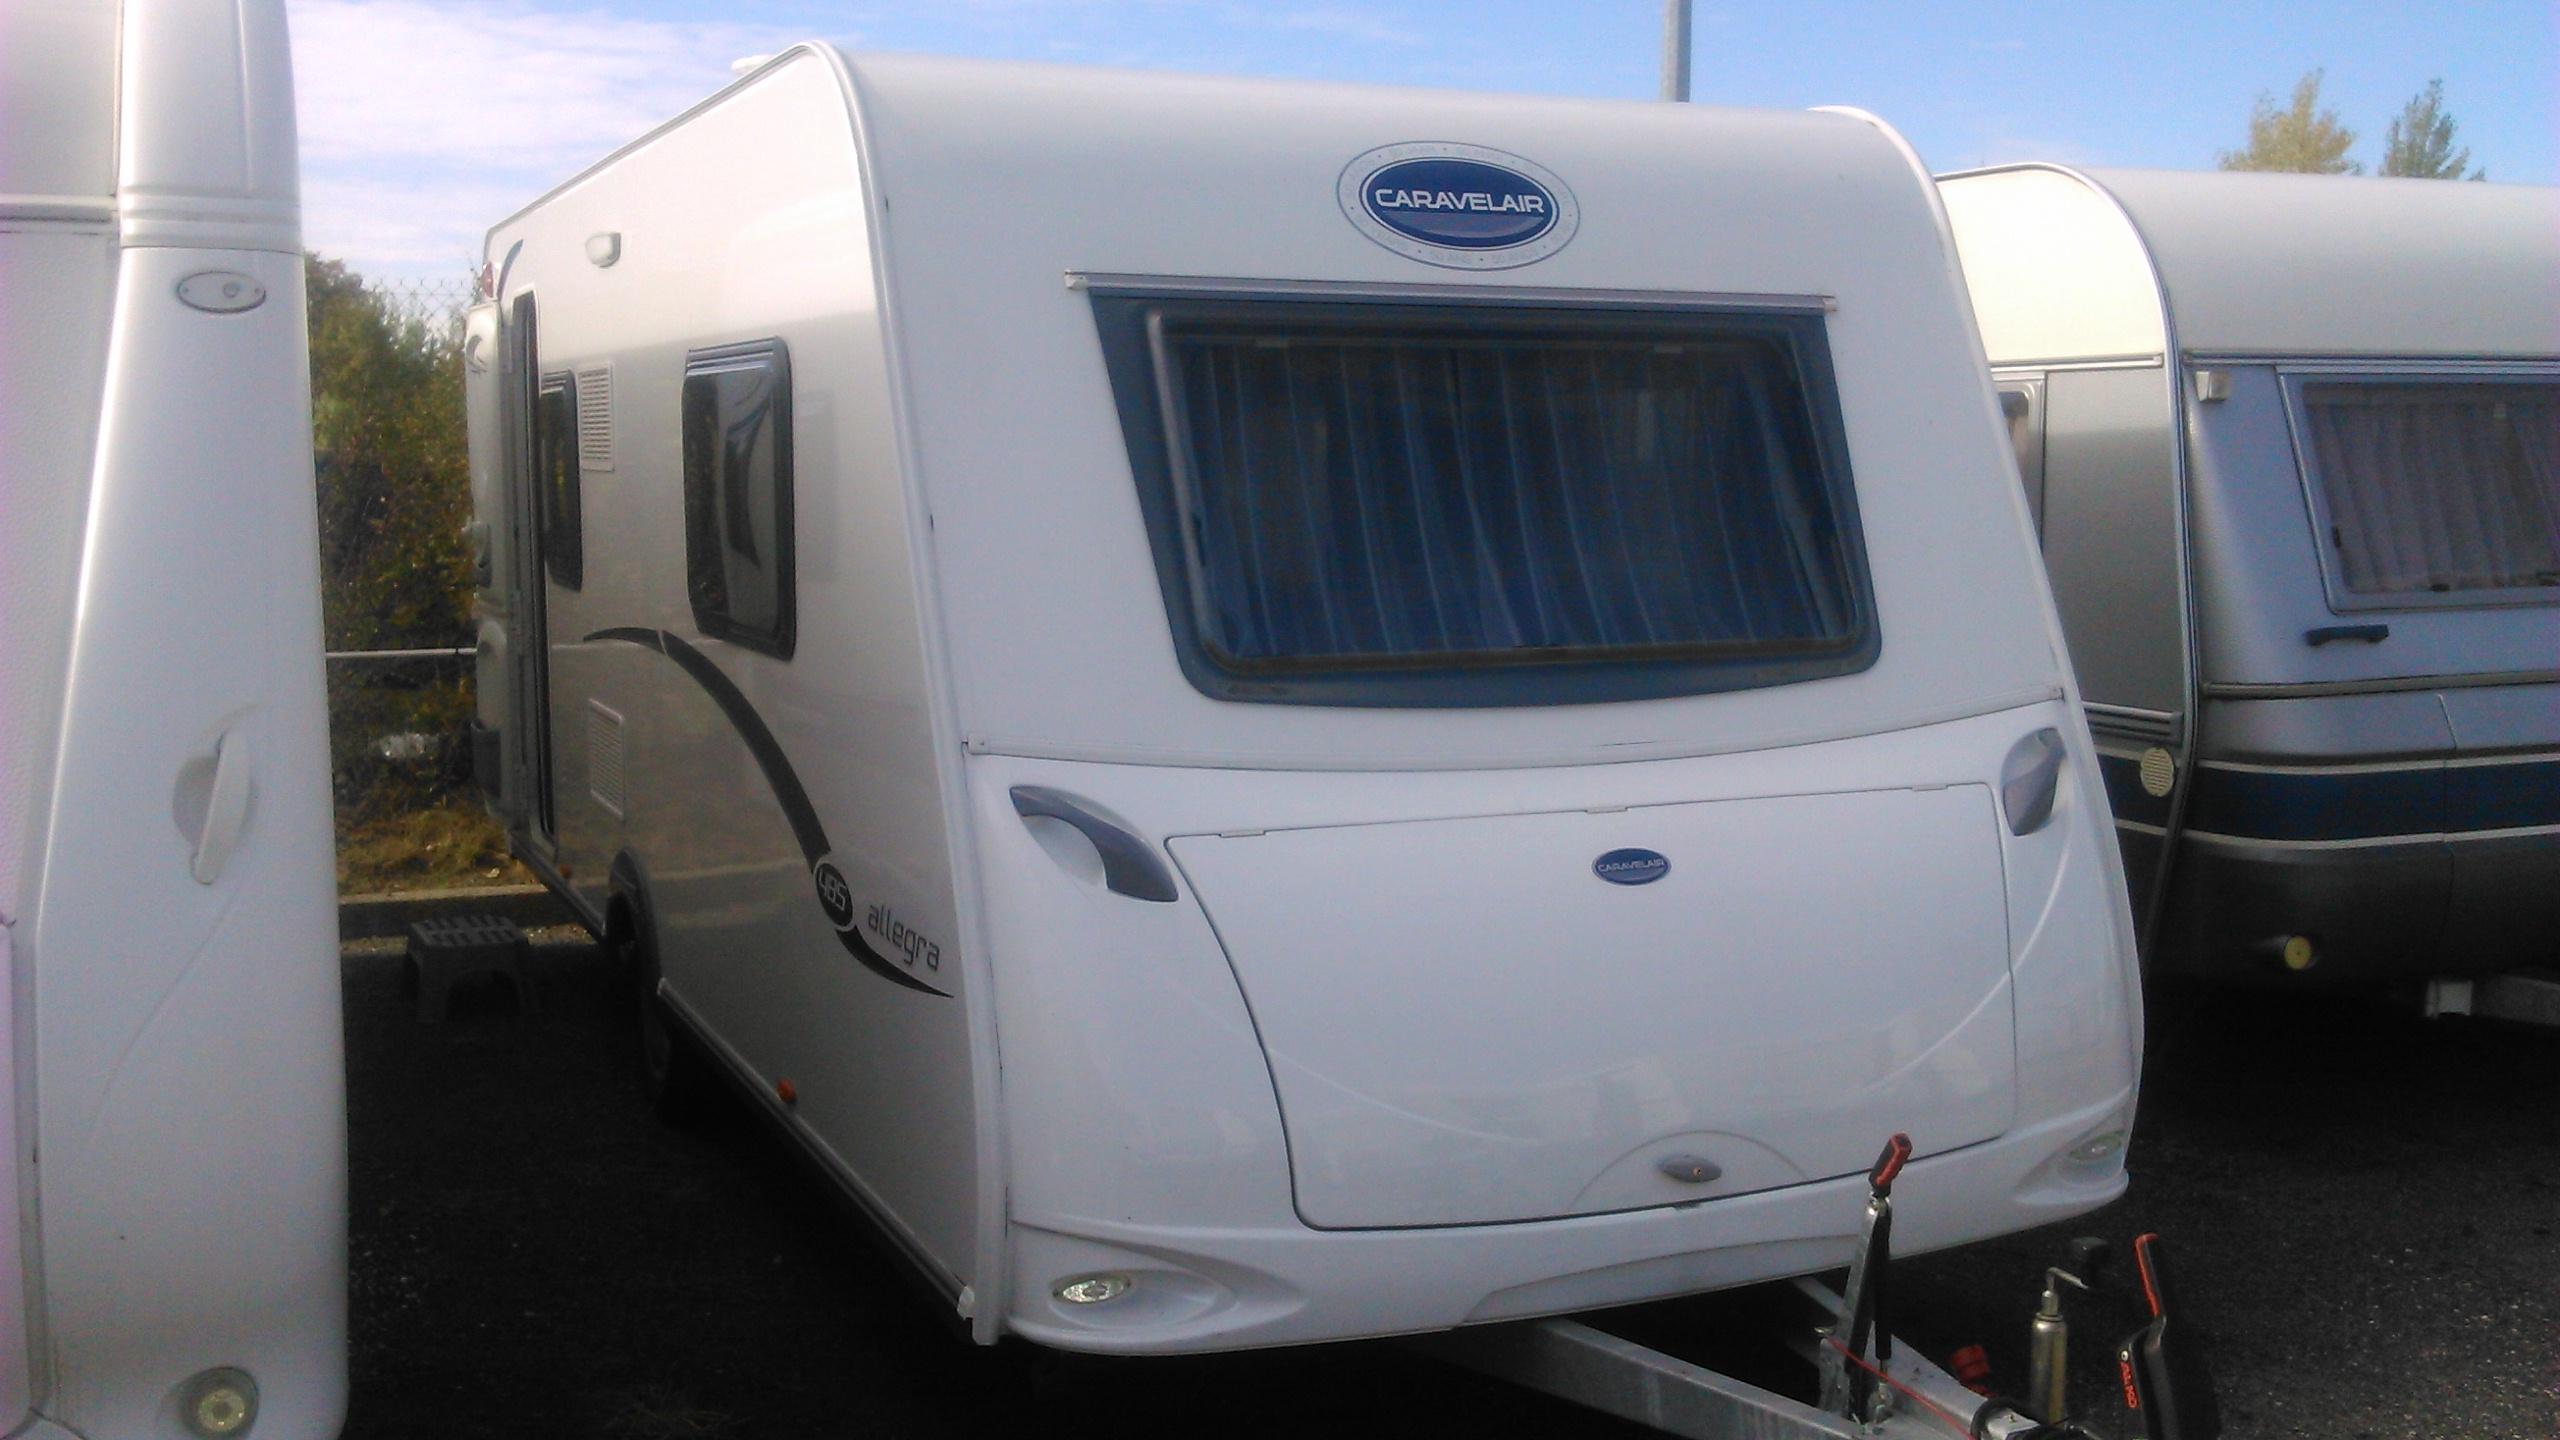 caravelair allegra 485 occasion de 2012 caravane en vente checy loiret 45. Black Bedroom Furniture Sets. Home Design Ideas